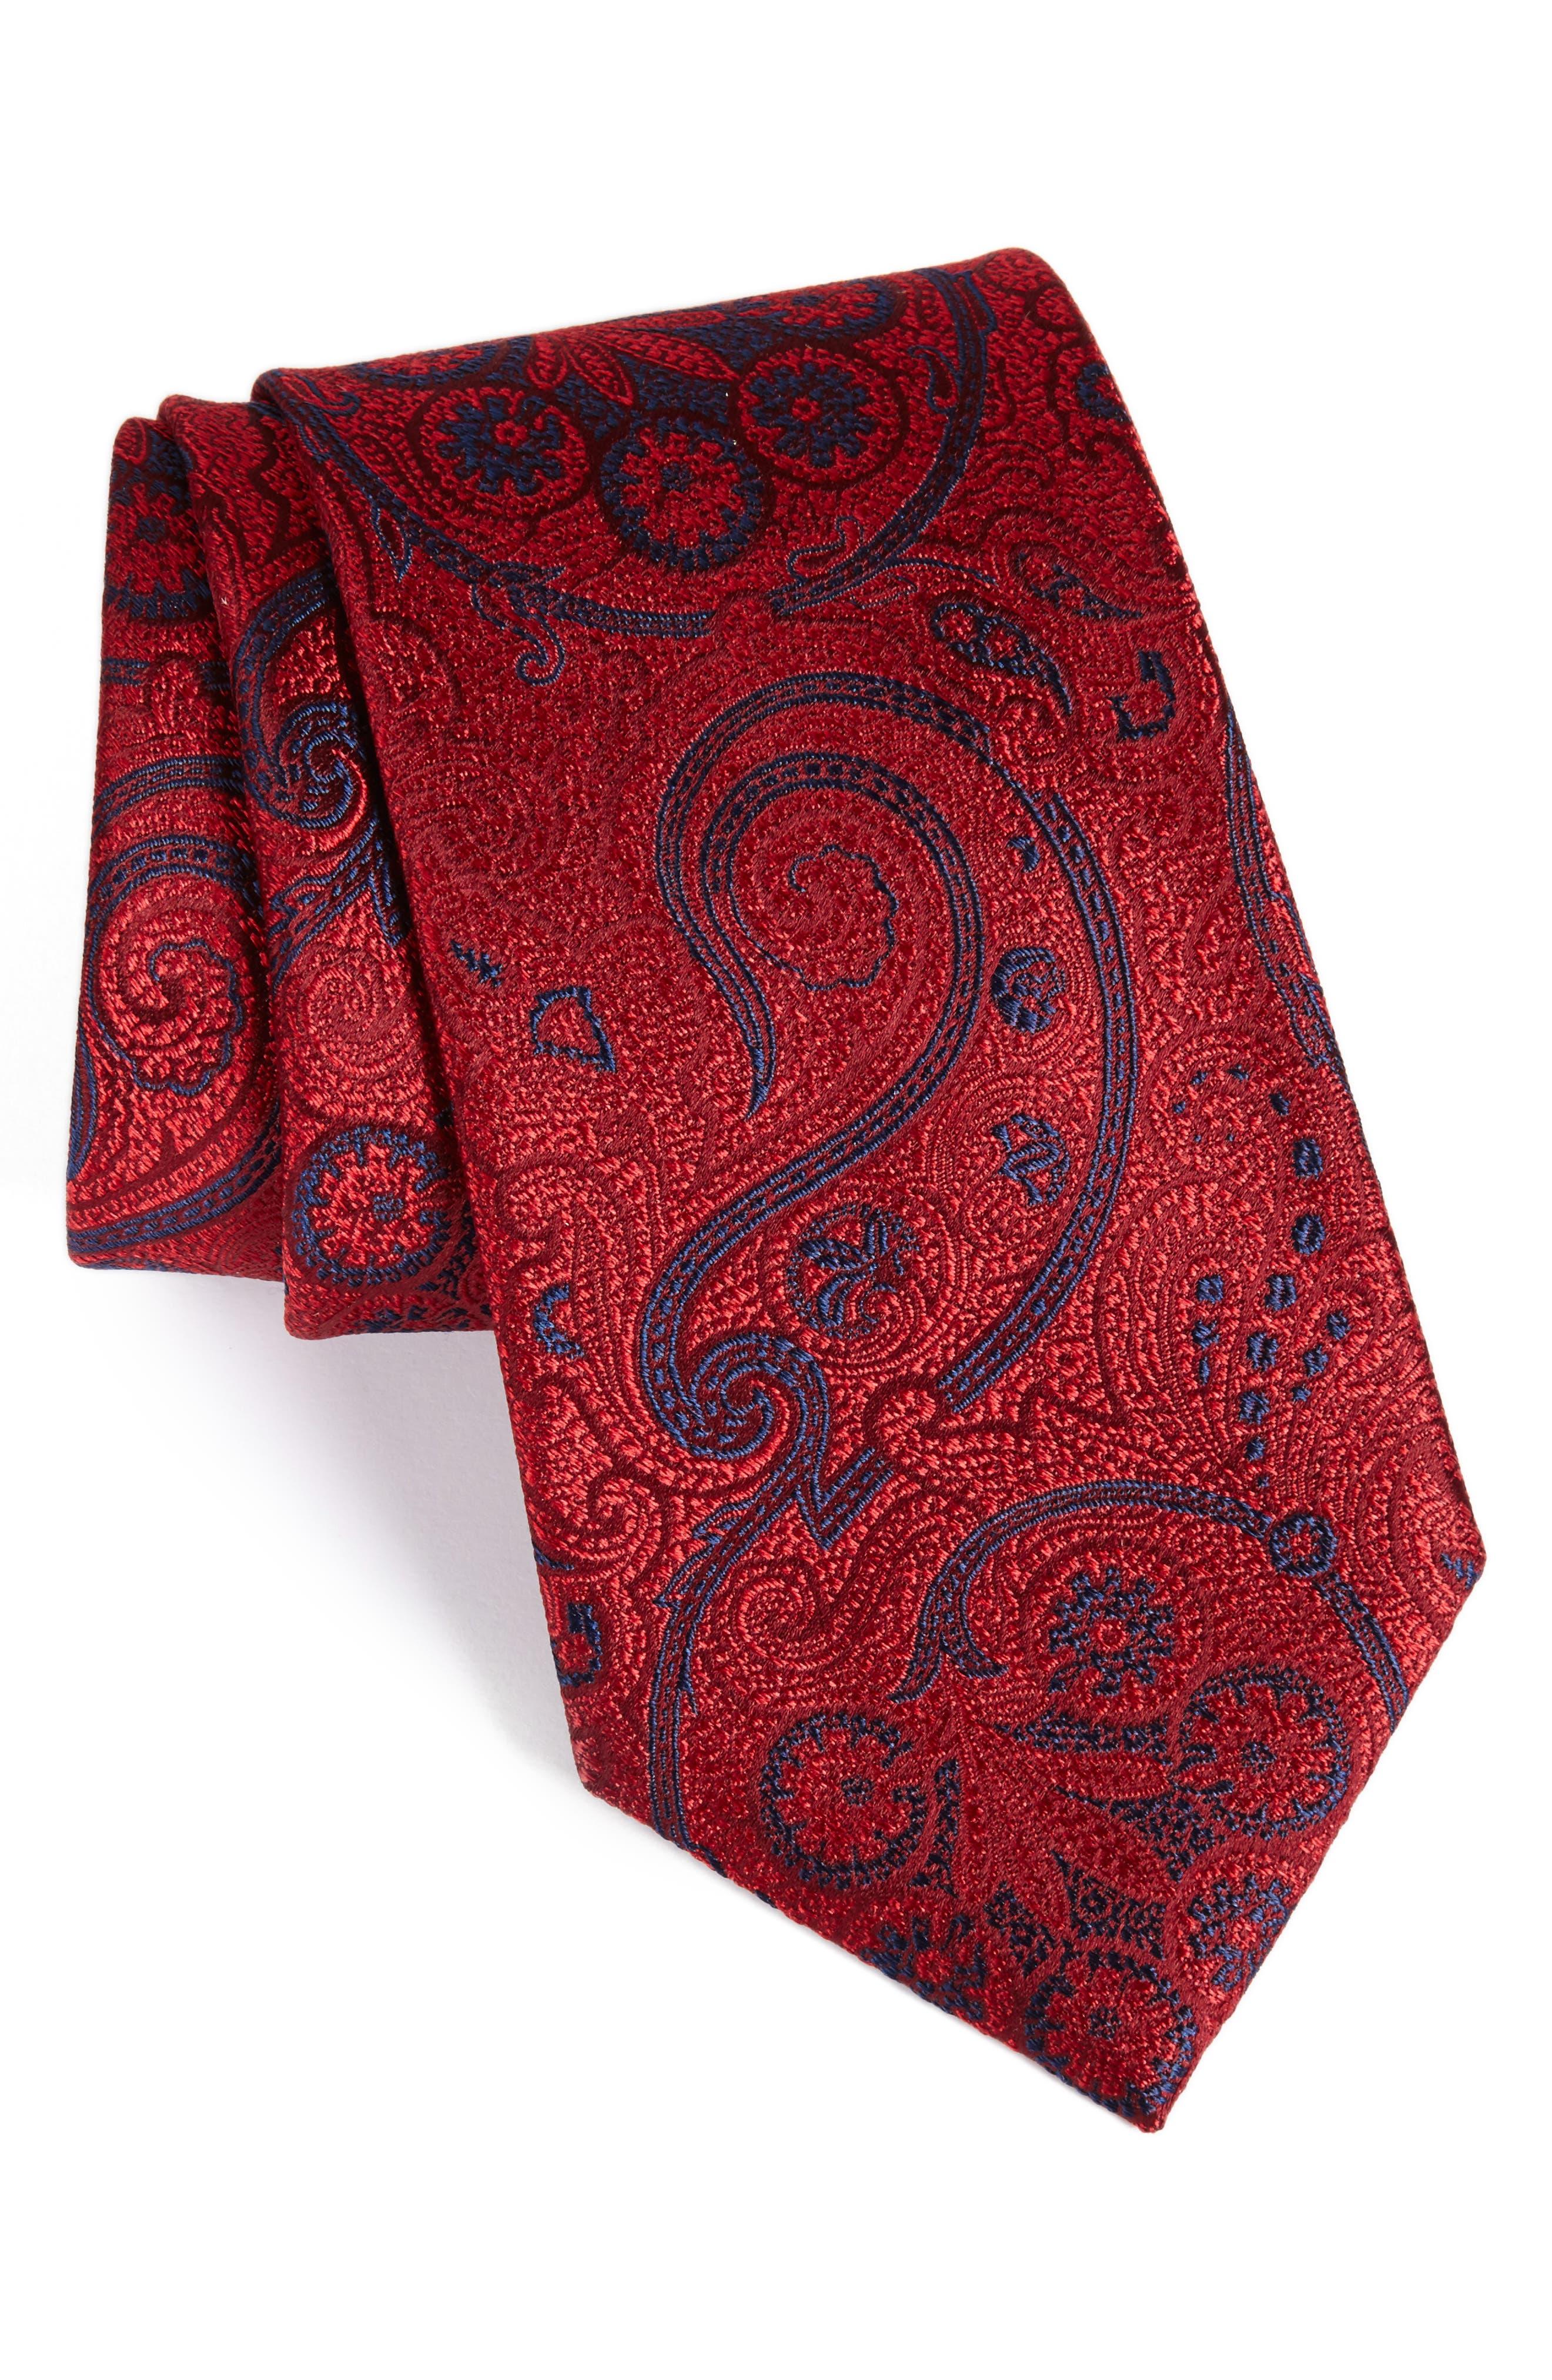 Alternate Image 1 Selected - Nordstrom Men's Shop Provincial Paisley Silk Tie